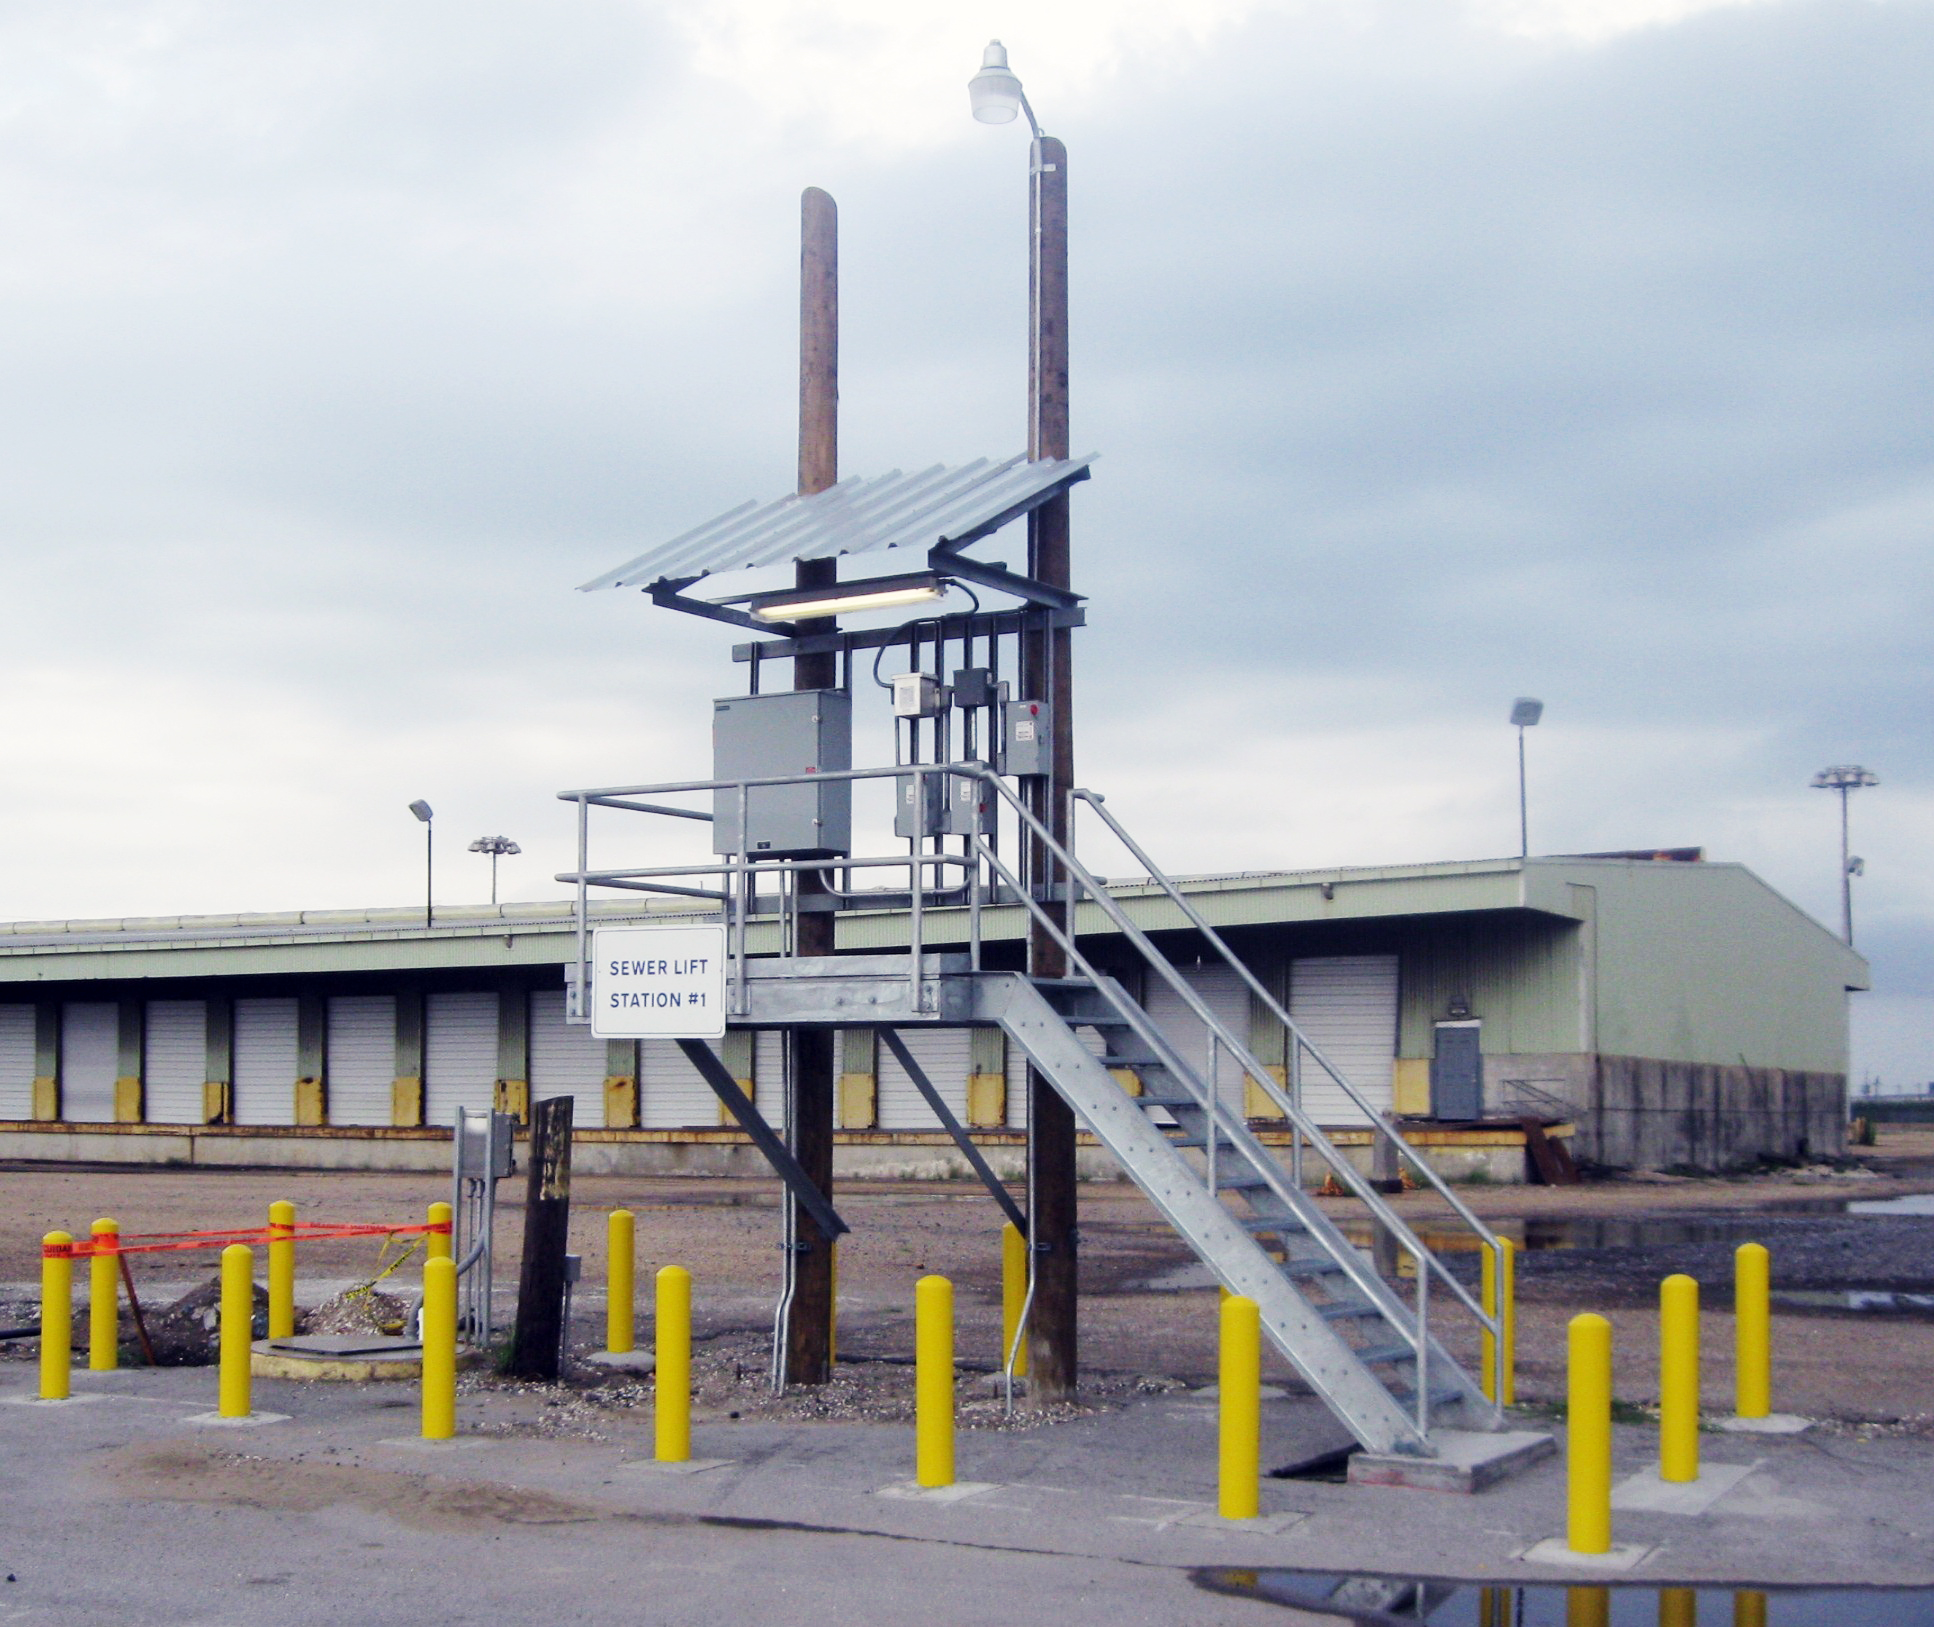 Port of New Orleans Lift Station Electrical Control Panel Platform, New Orleans, LA